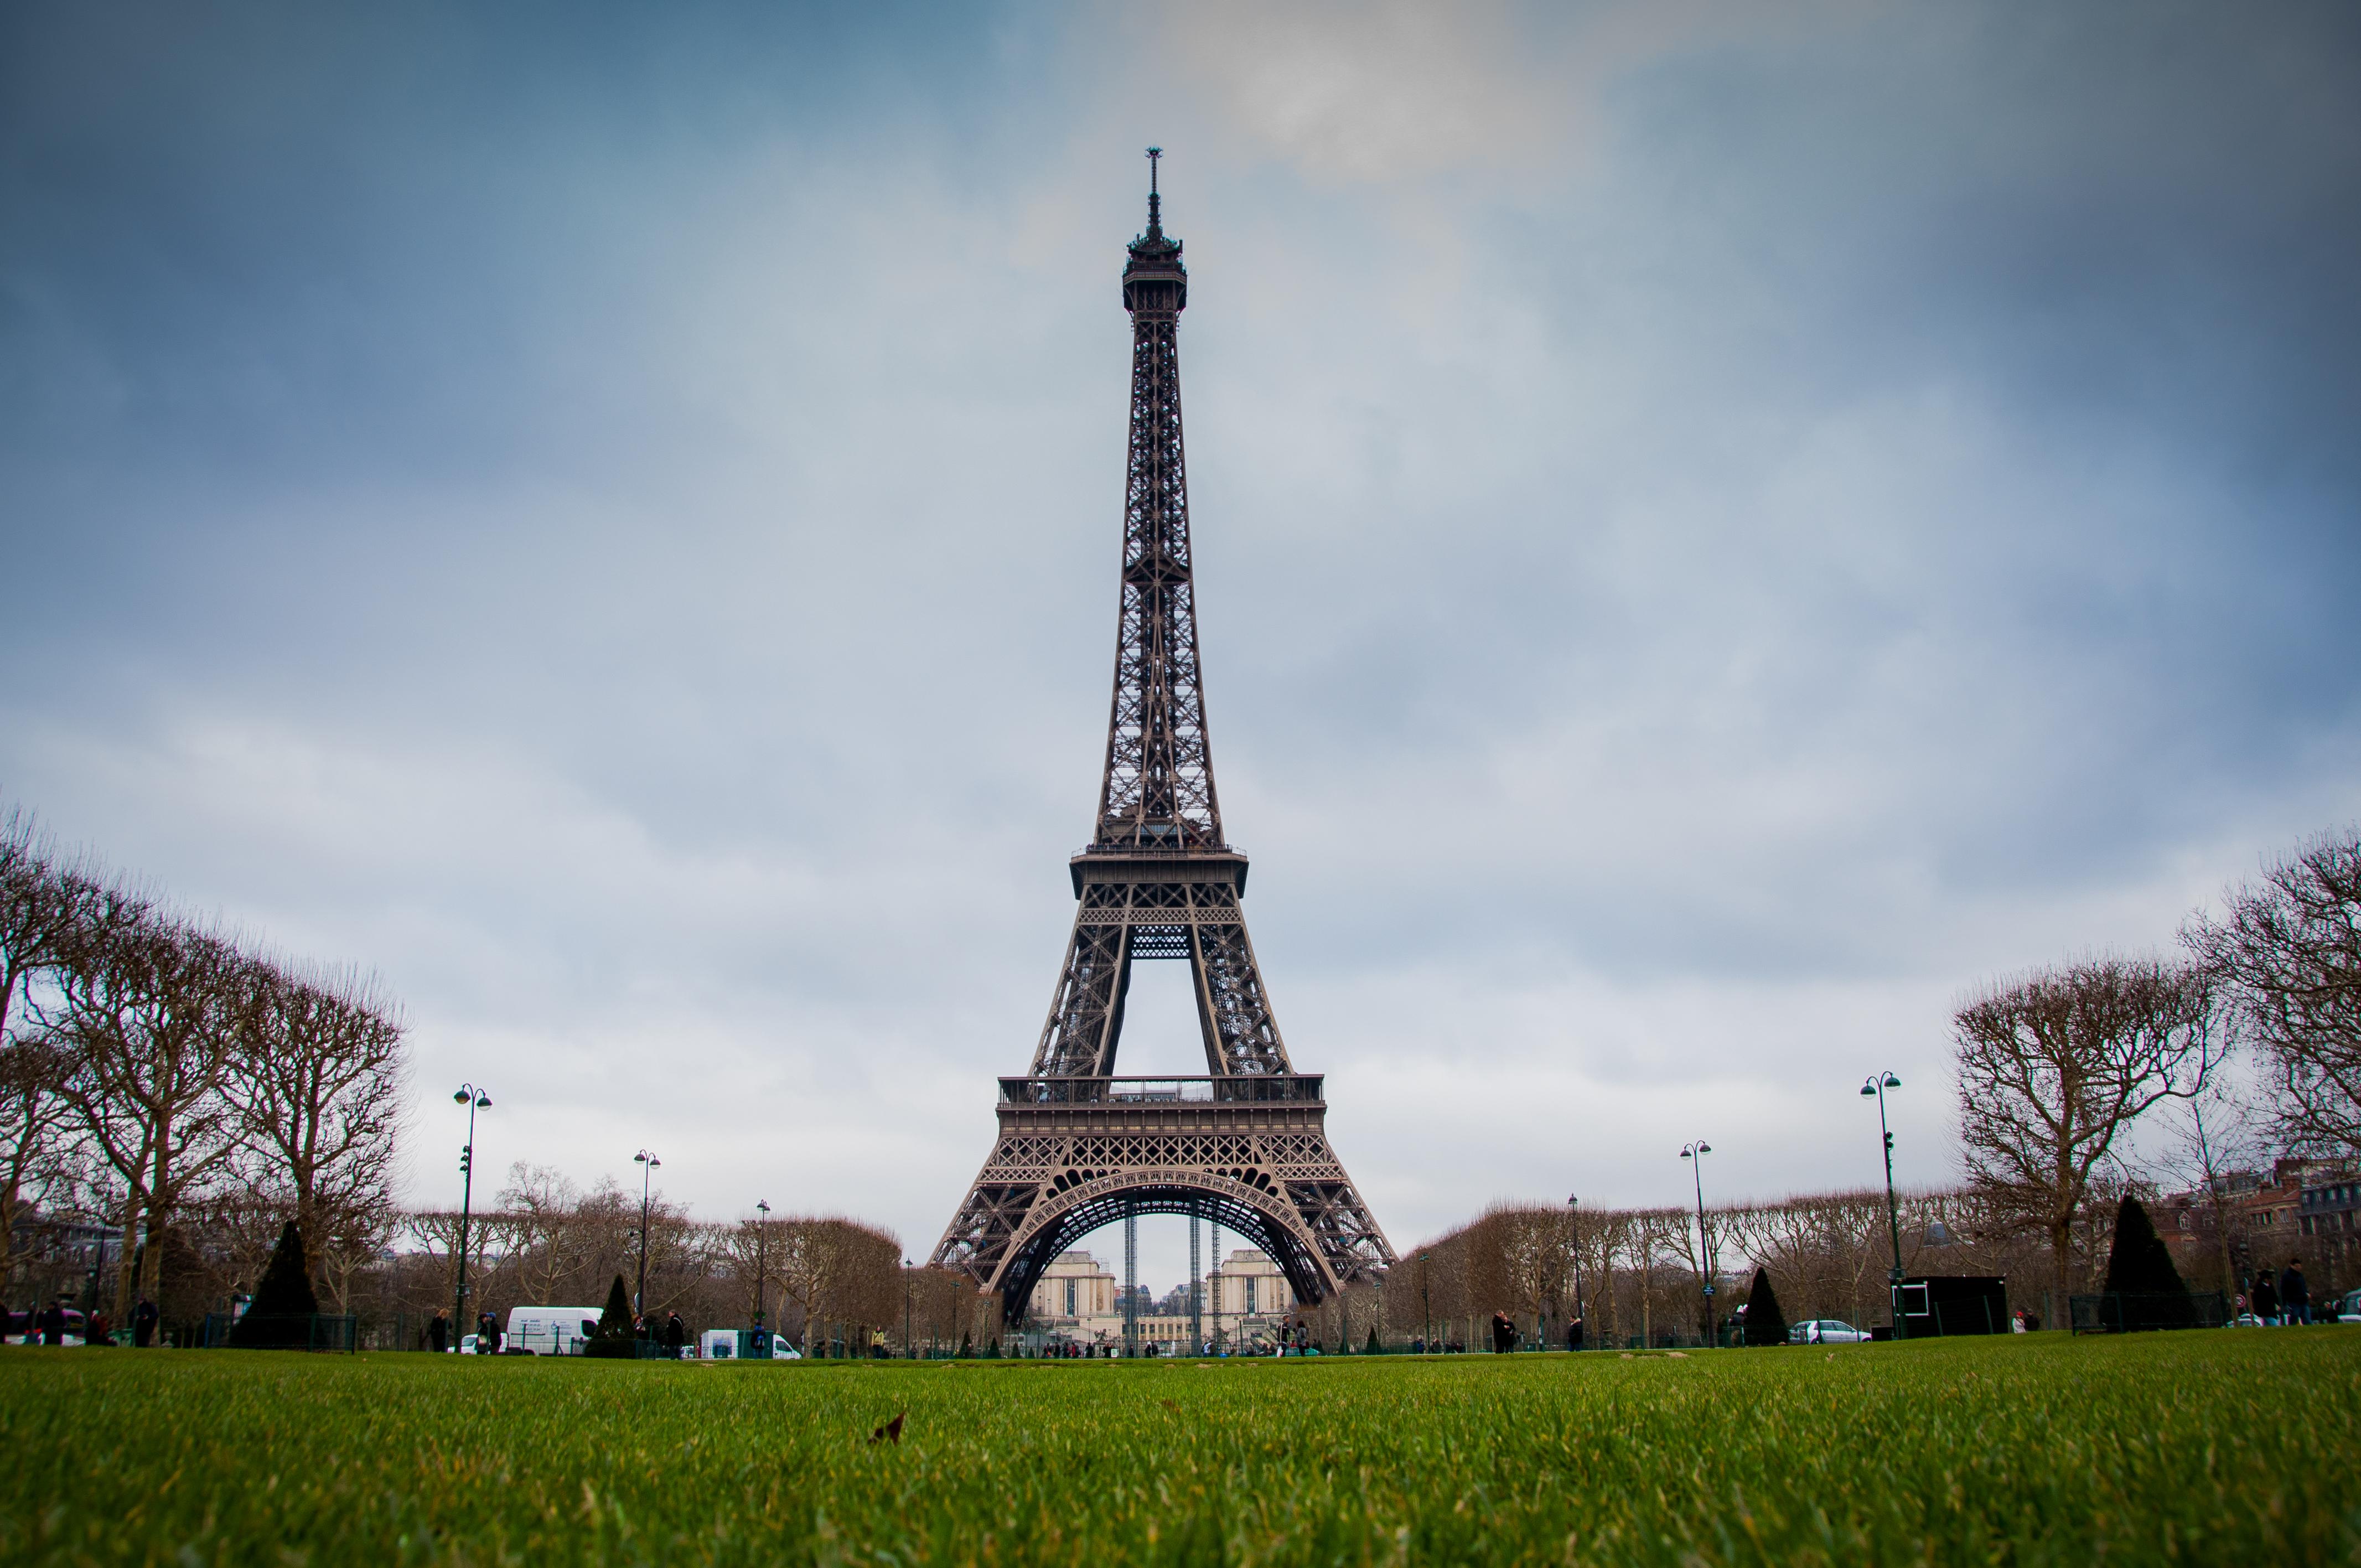 Horizontal Lines Of Paris 4k Ultra HD Wallpaper